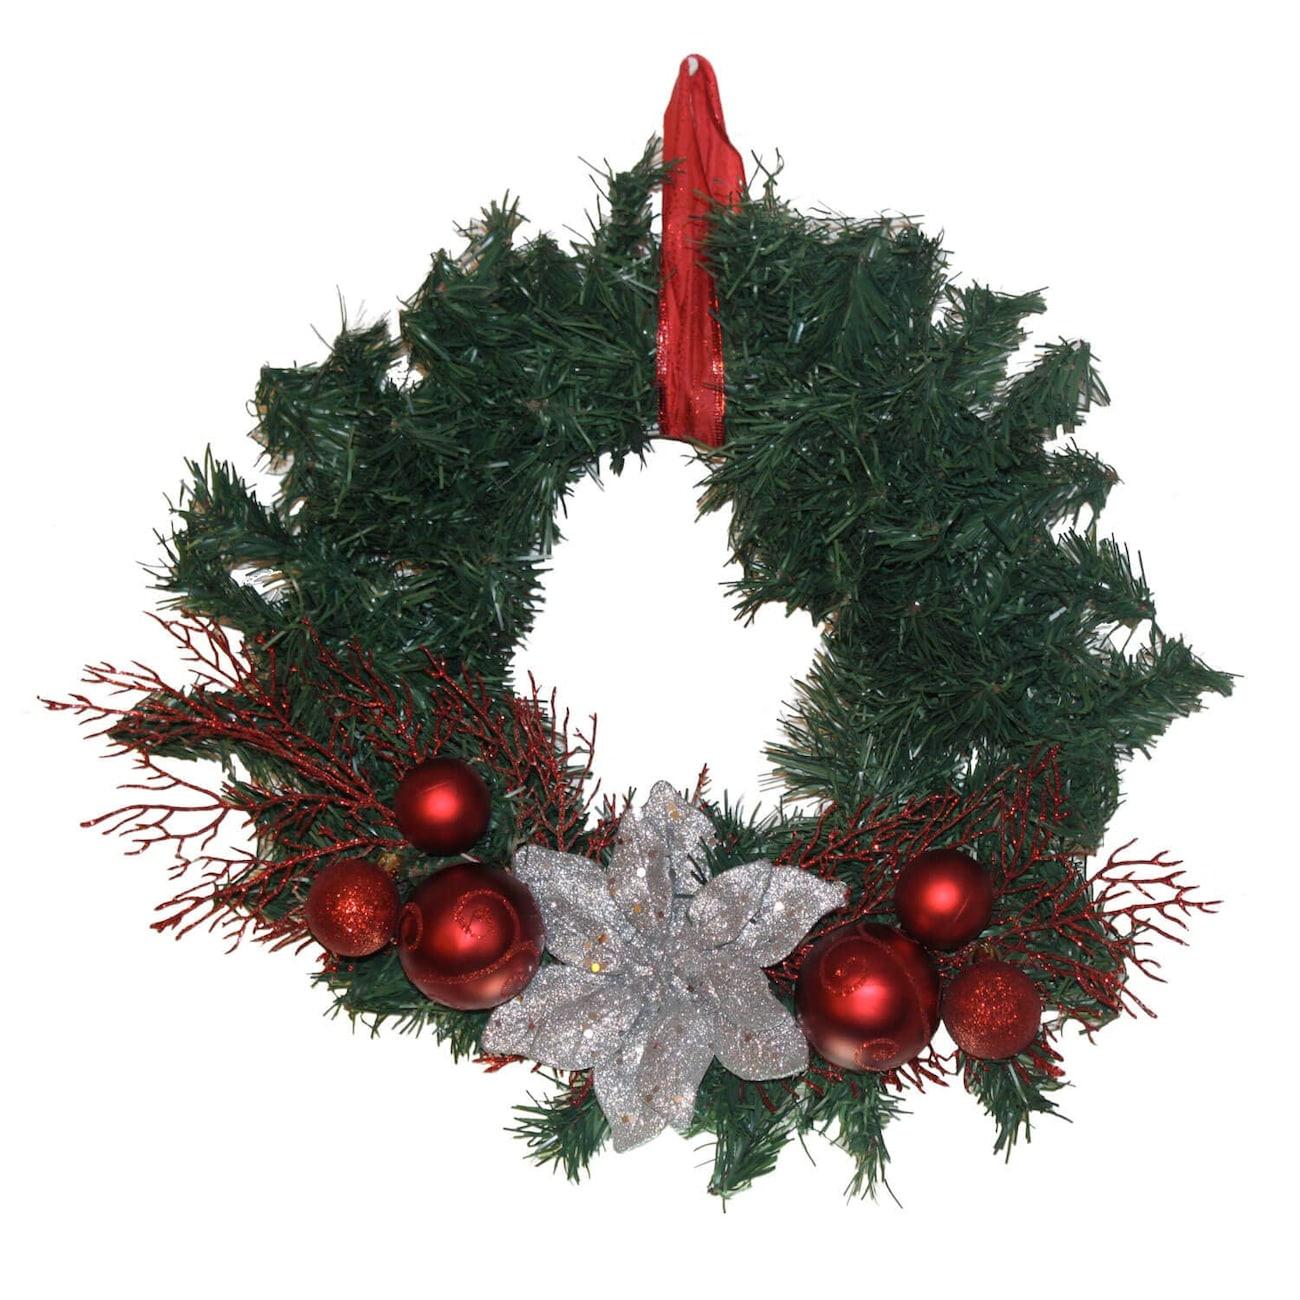 Christmas Craft Idea: Contemporary Wreath